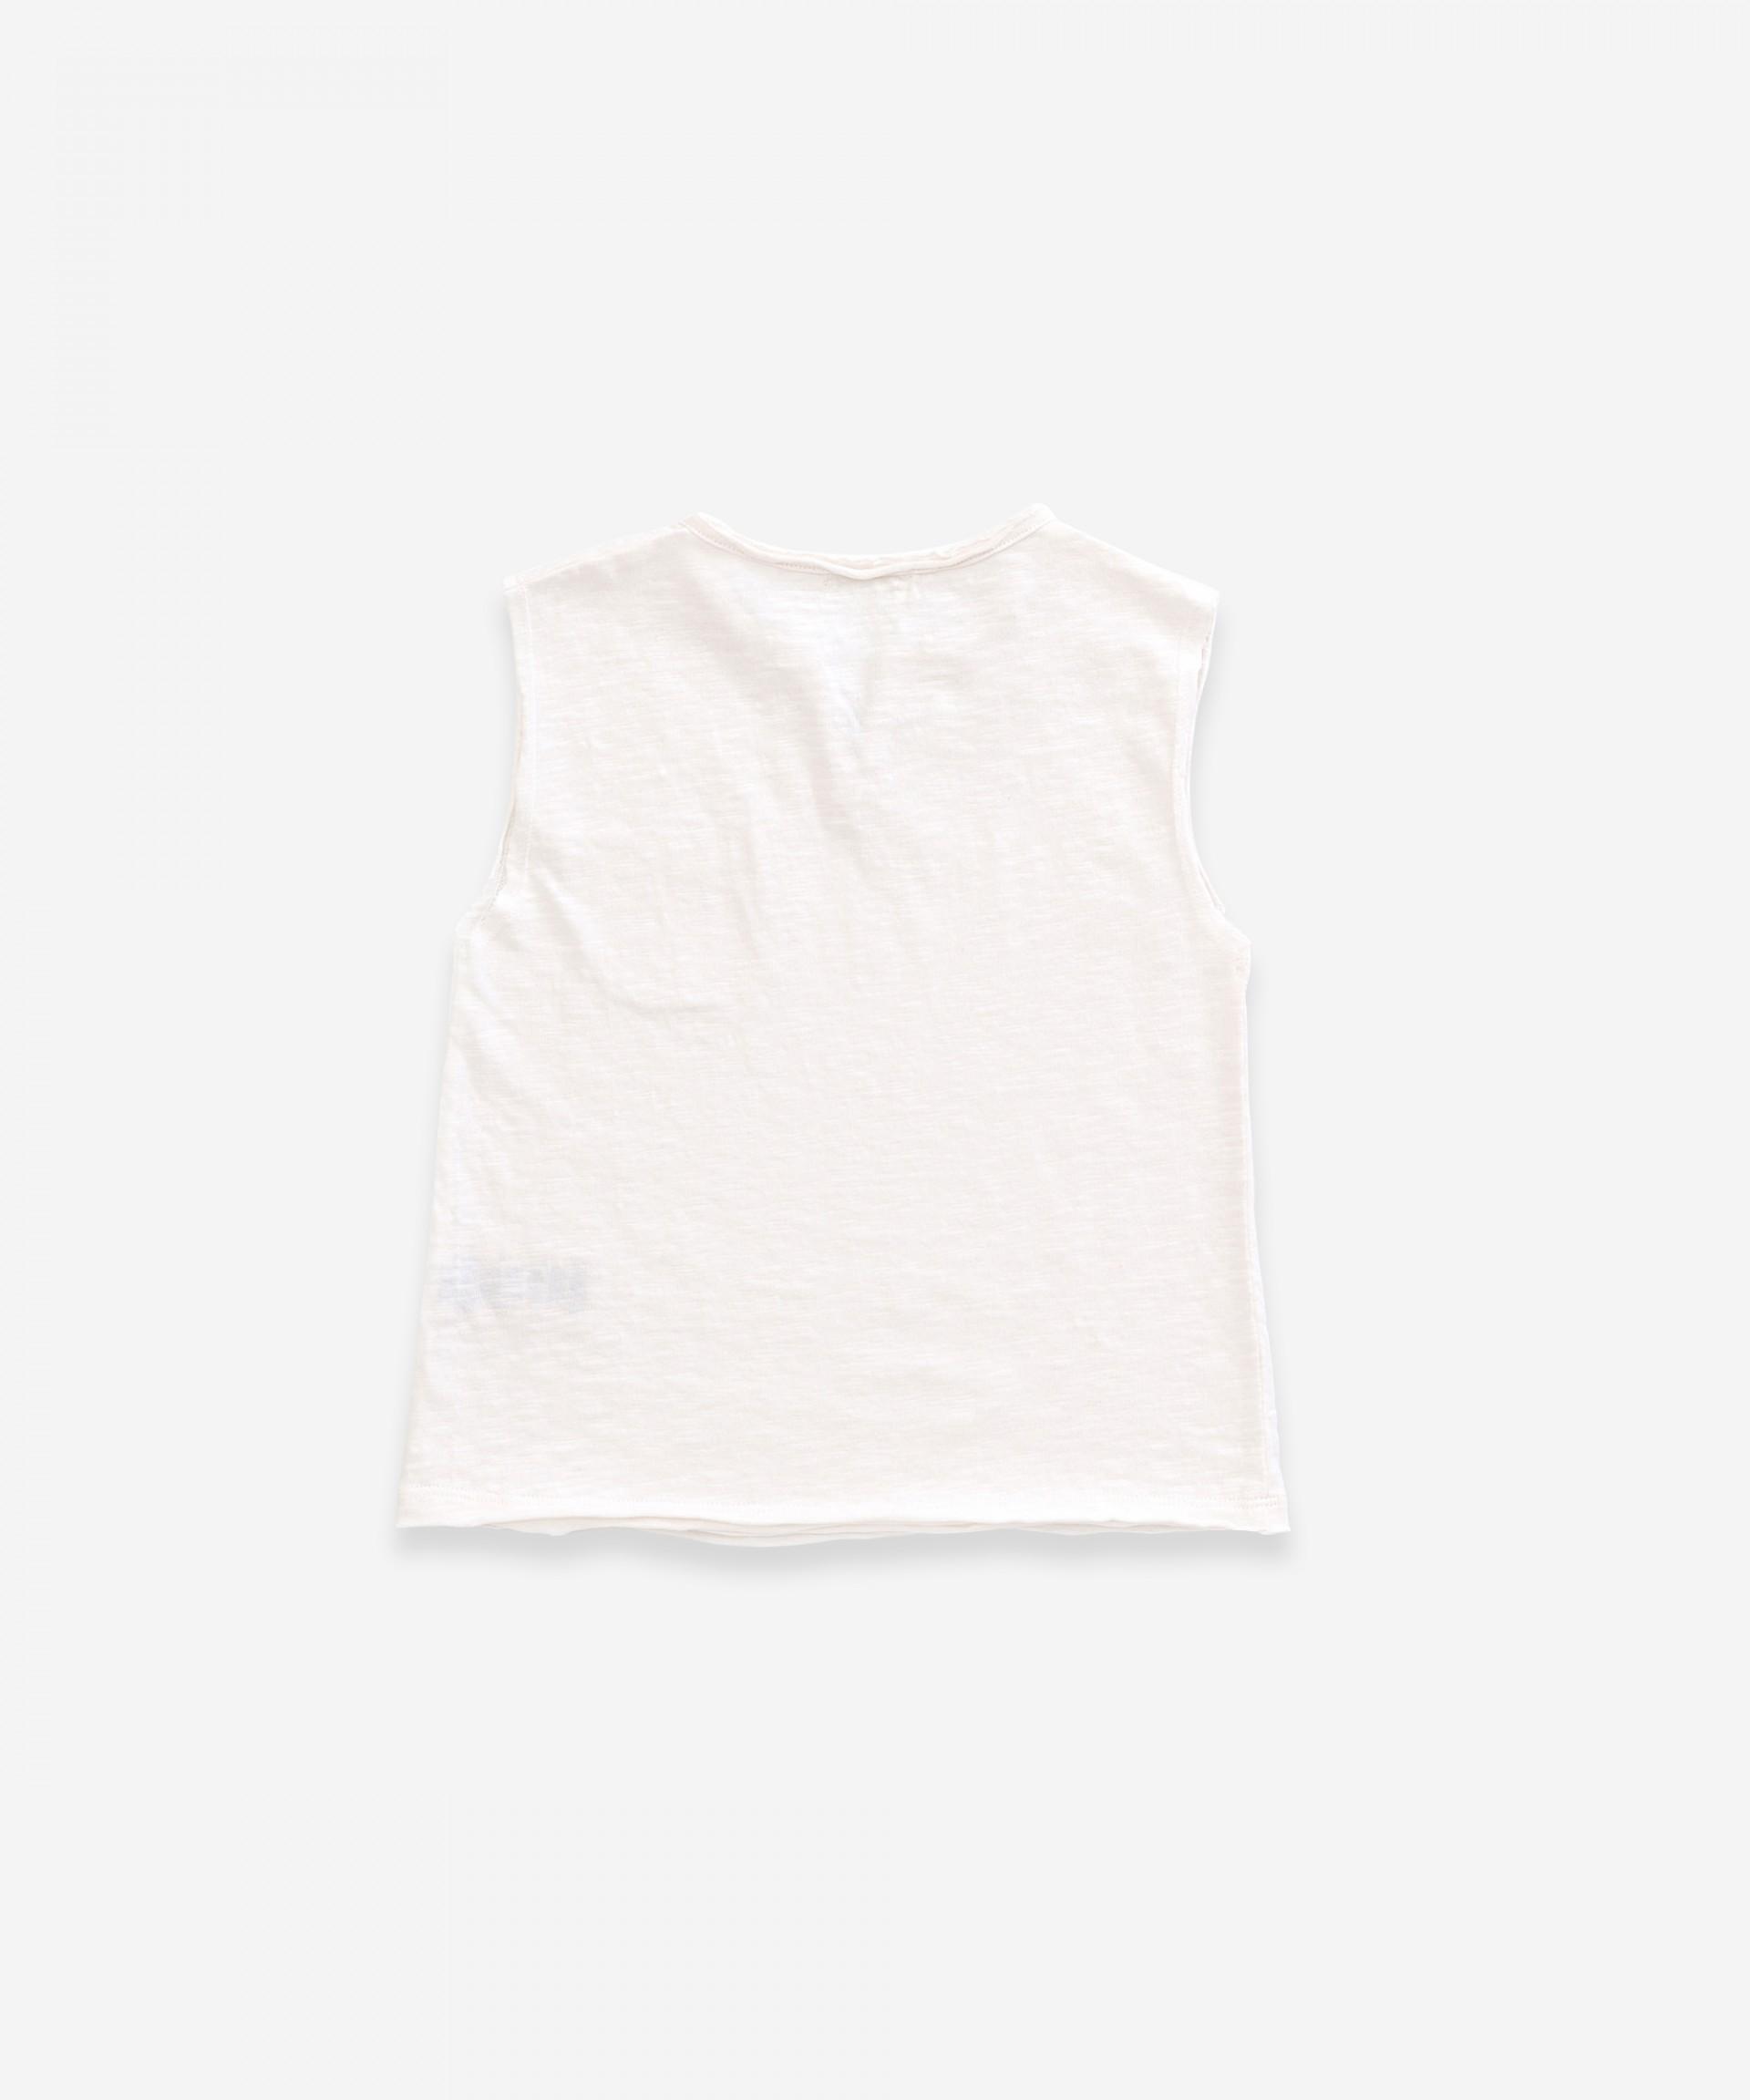 Camiseta sin mangas de algodón orgánico| Weaving